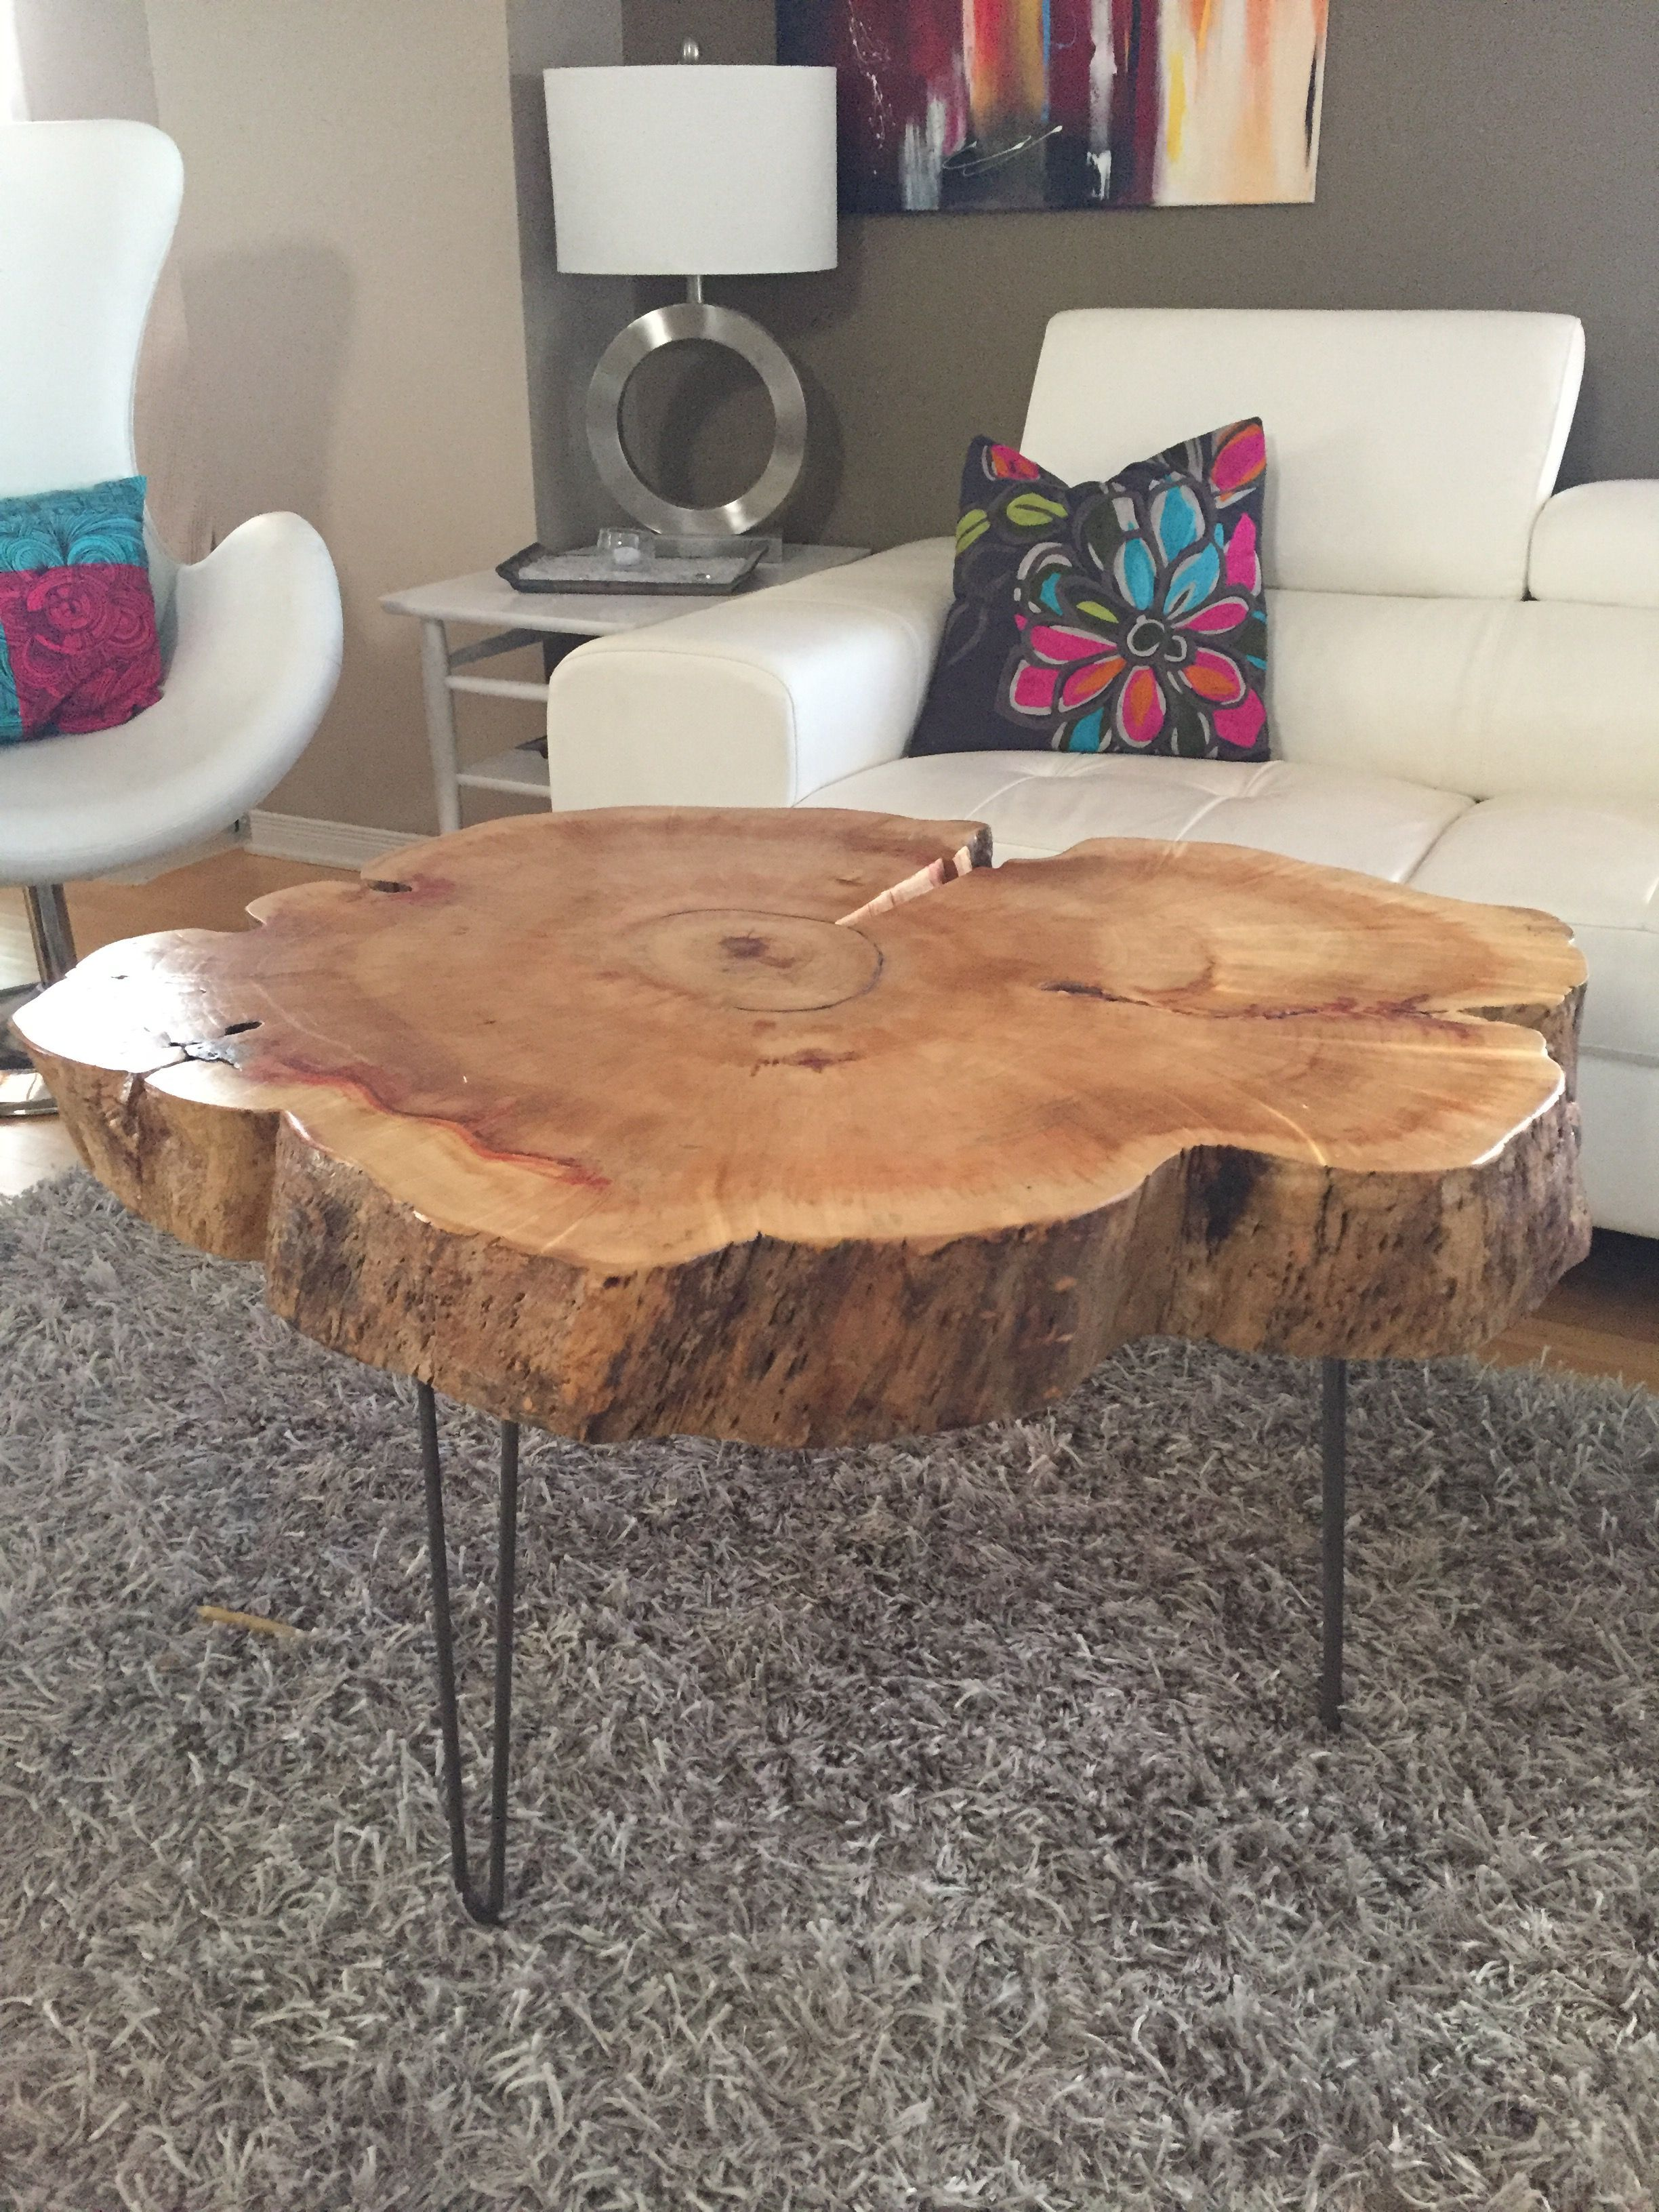 Tree Trunk Table With Metal Legs Wood Coffee Table With Hairpin Legs Coffee Treestumptable Coffee Table Wood Diy Coffee Table Coffee Table Design [ 3264 x 2448 Pixel ]